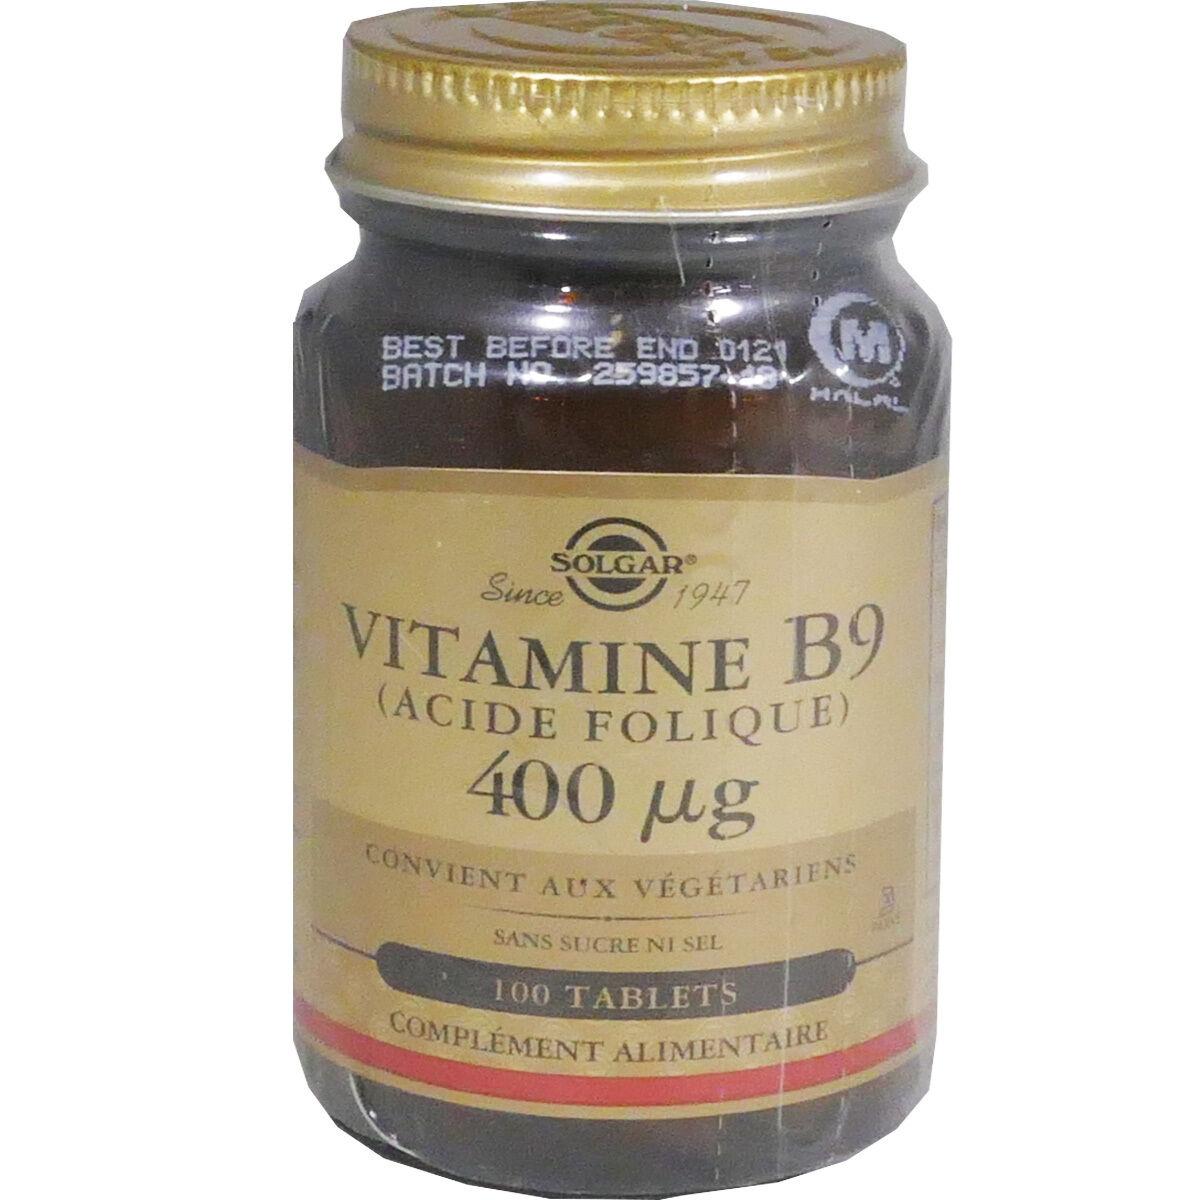 Solgar vitamine b9 acide folique 100 tablets